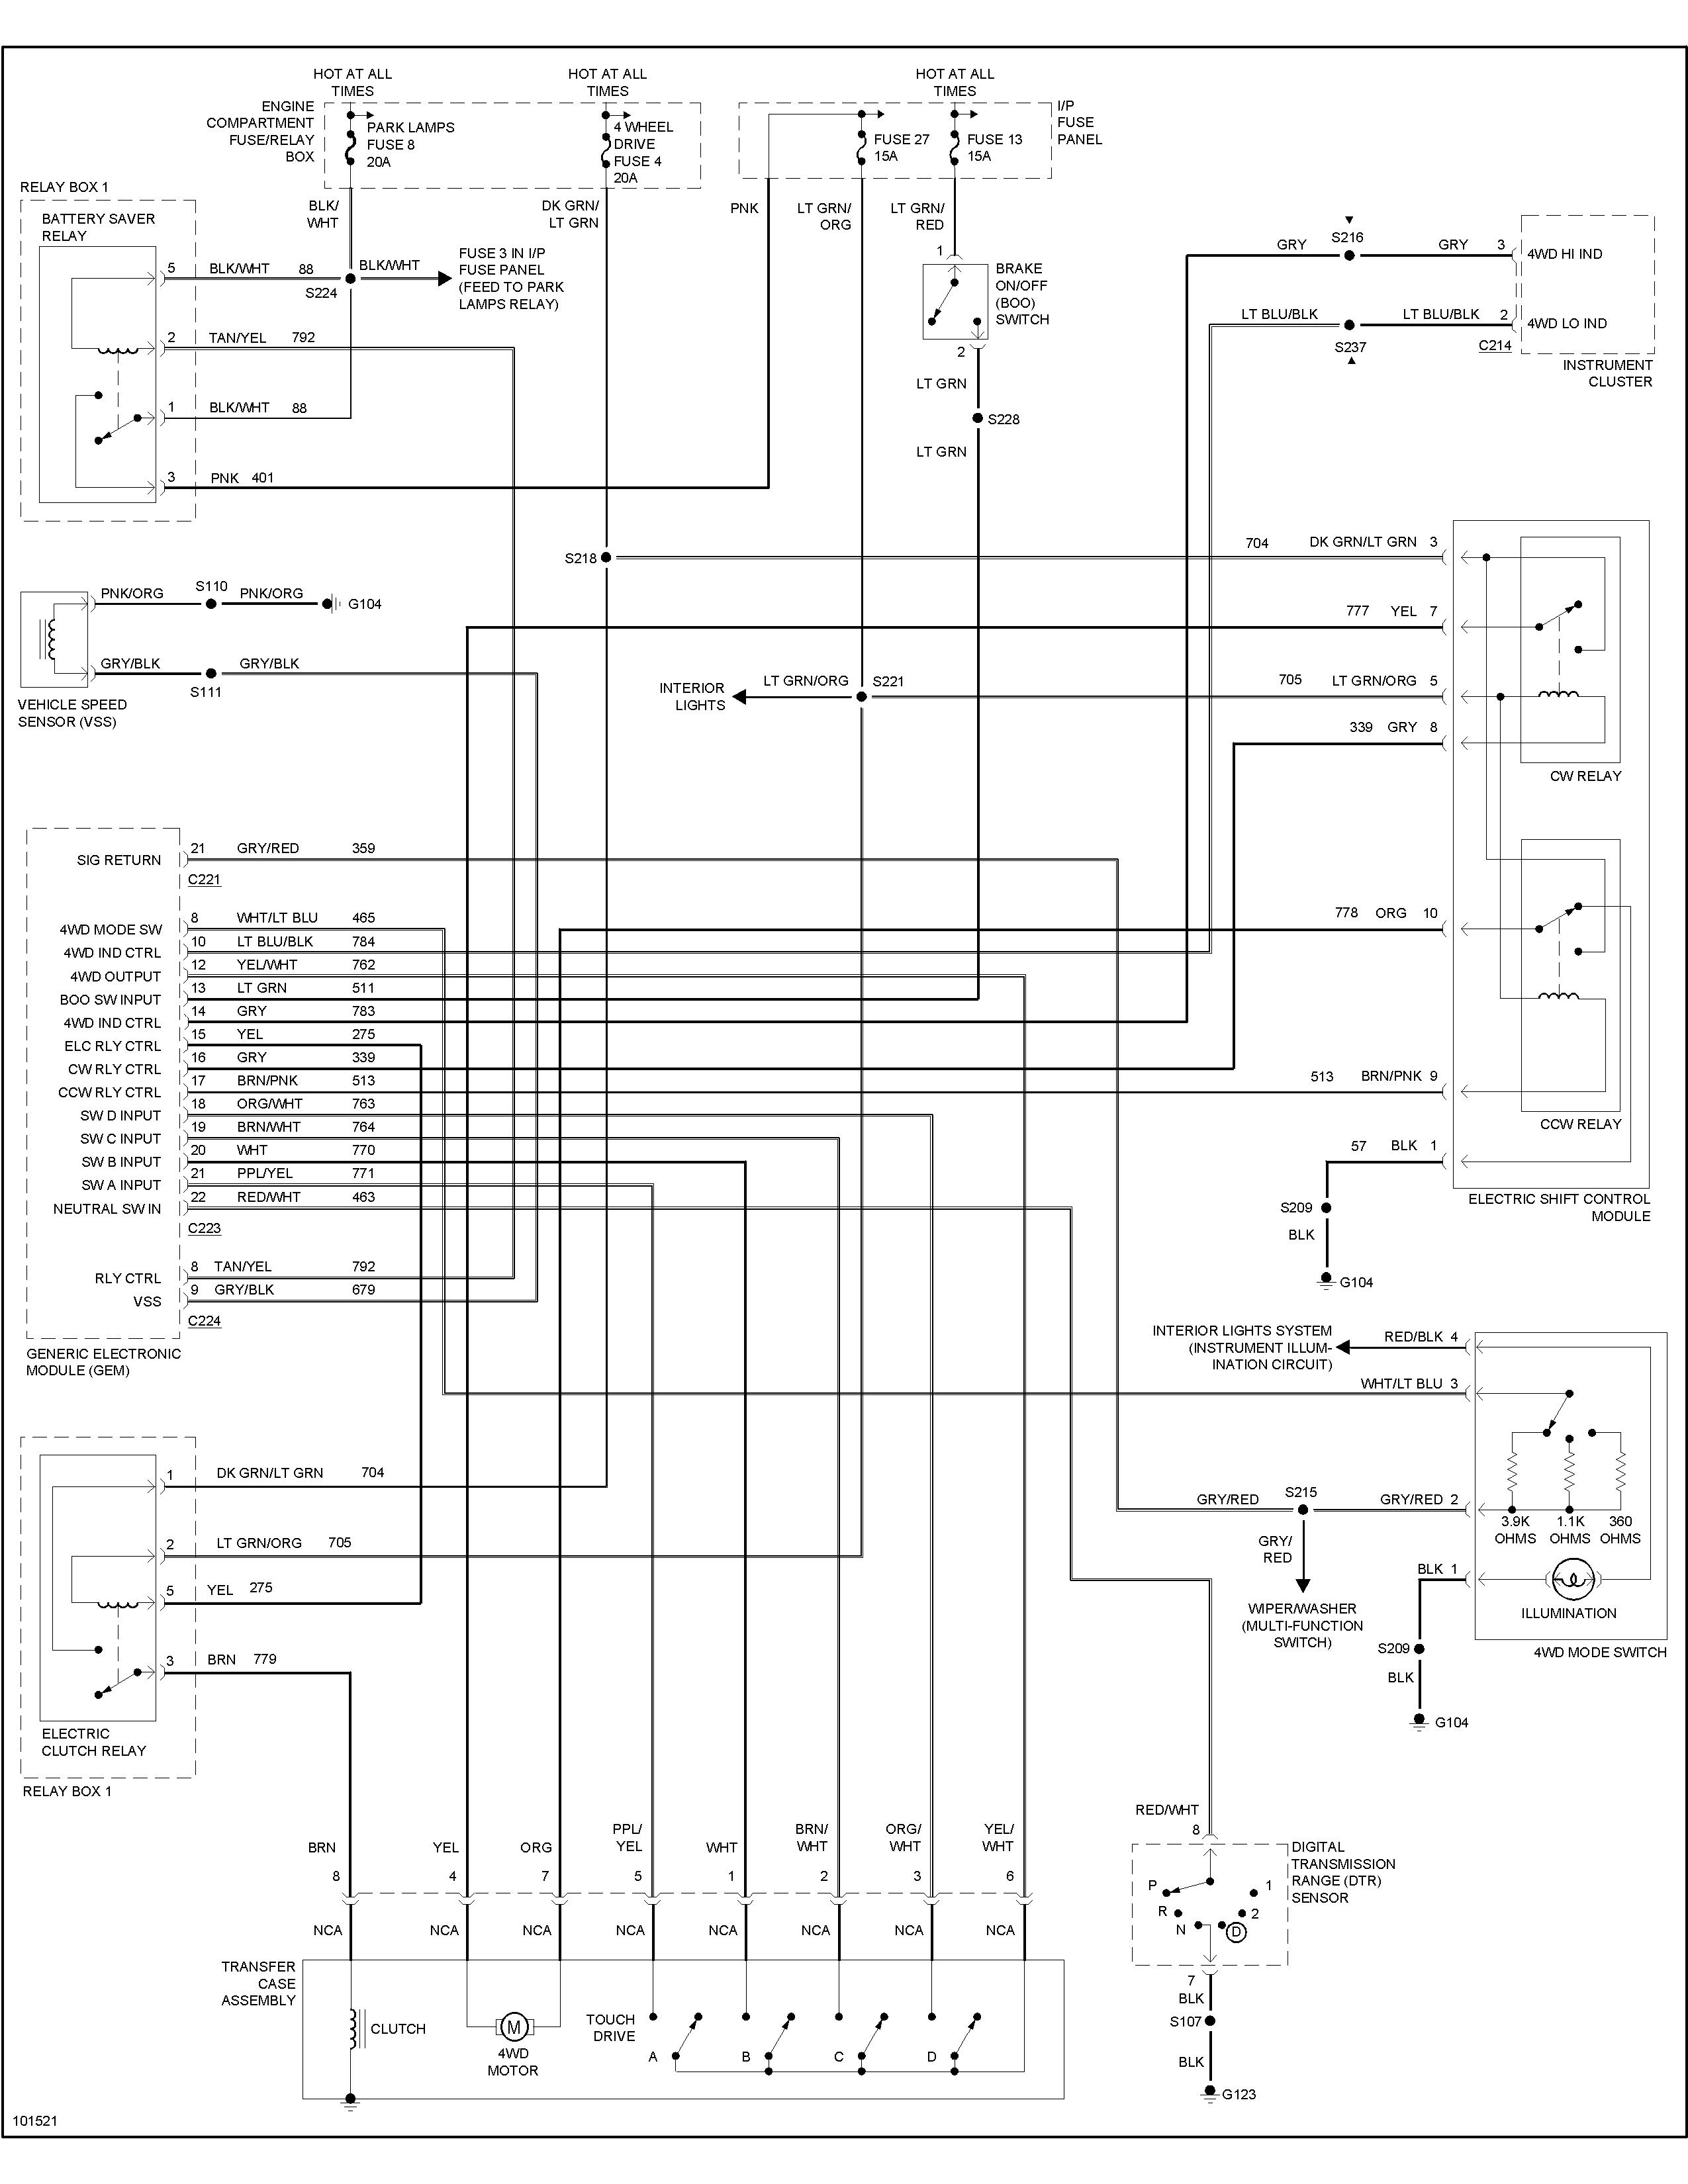 DIAGRAM] 1999 Ford Ranger Transfer Case Wiring Diagram FULL Version HD  Quality Wiring Diagram - COMPLICATEDVENNDIAGRAM.AEROPORTOLUCCATASSIGNANO.ITaeroportoluccatassignano.it